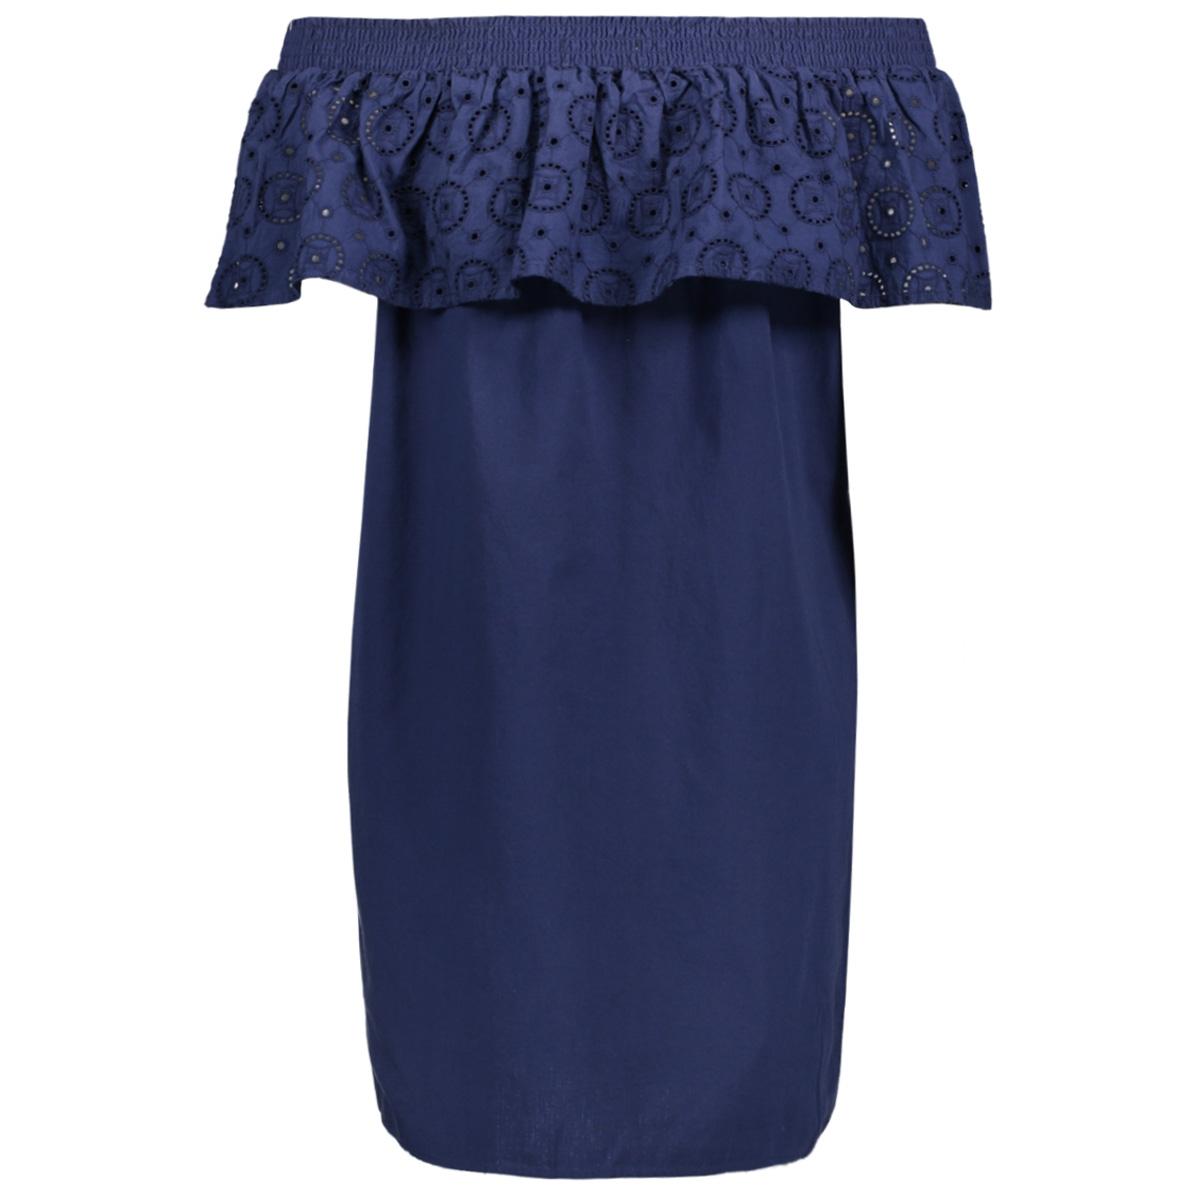 1003869xx71 tom tailor jurk 11257